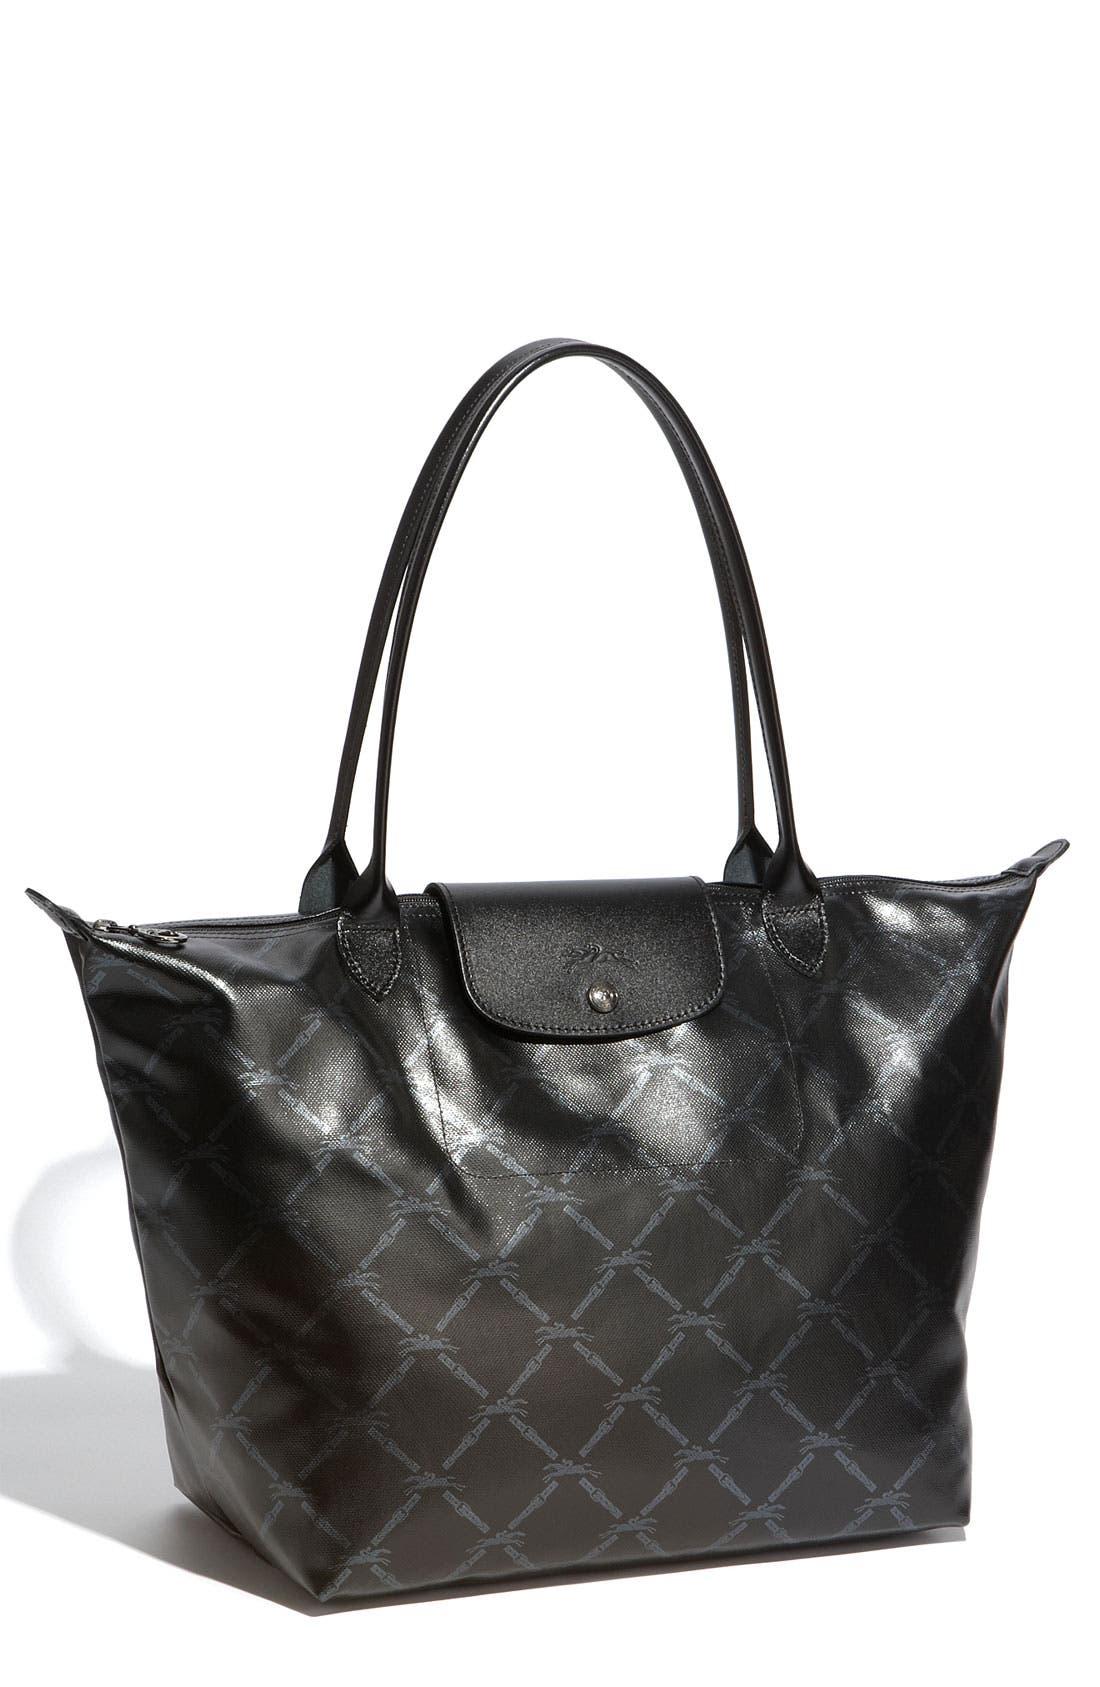 Main Image - Longchamp 'LM Metal' Shoulder Tote